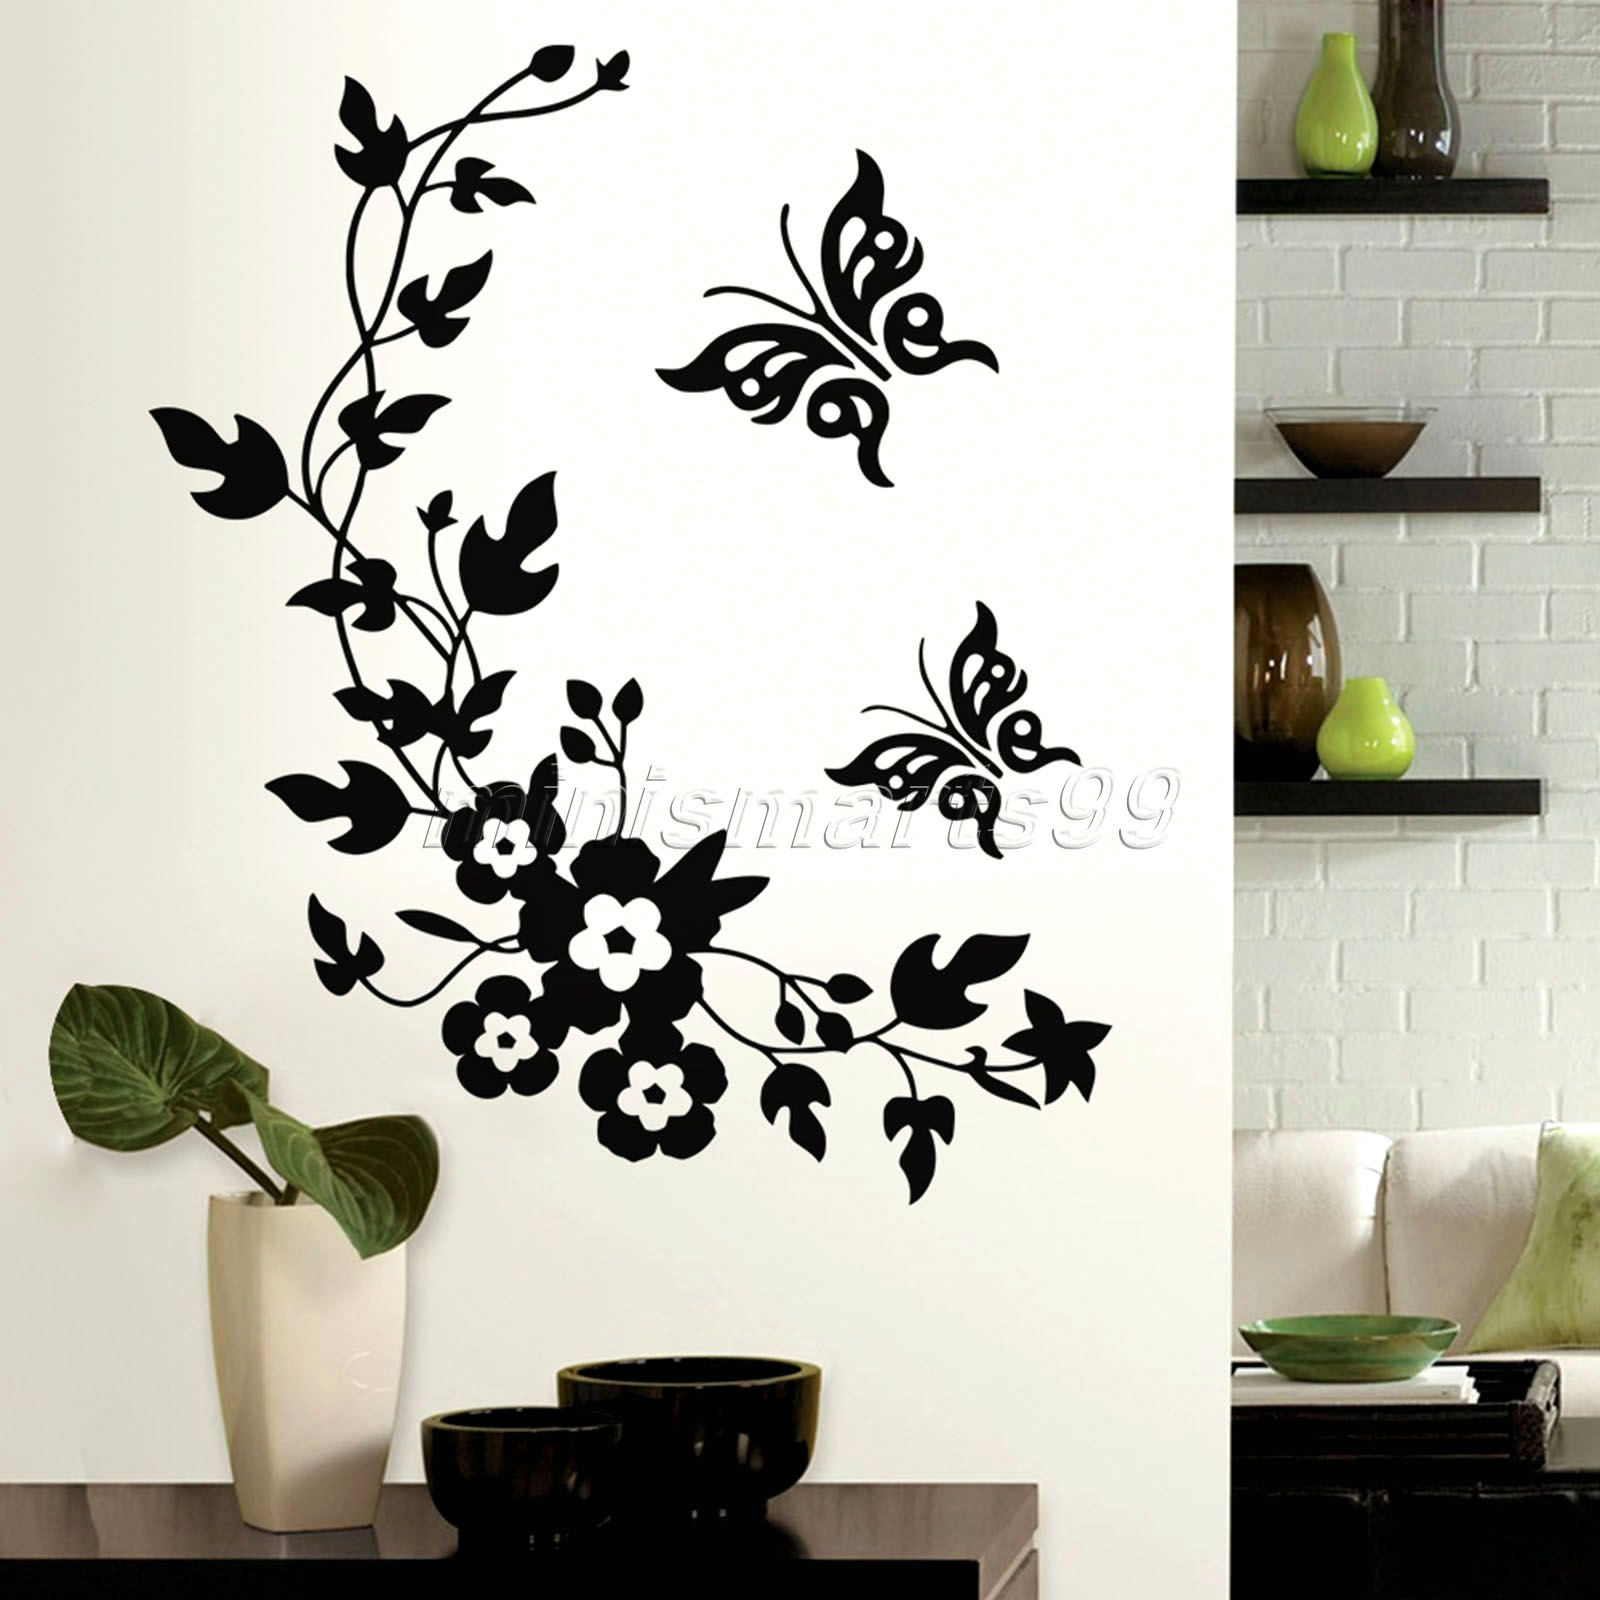 3D Carved Flowers Birds 18 Wallpaper Decal Dercor Home Kids Nursery Mural  Home